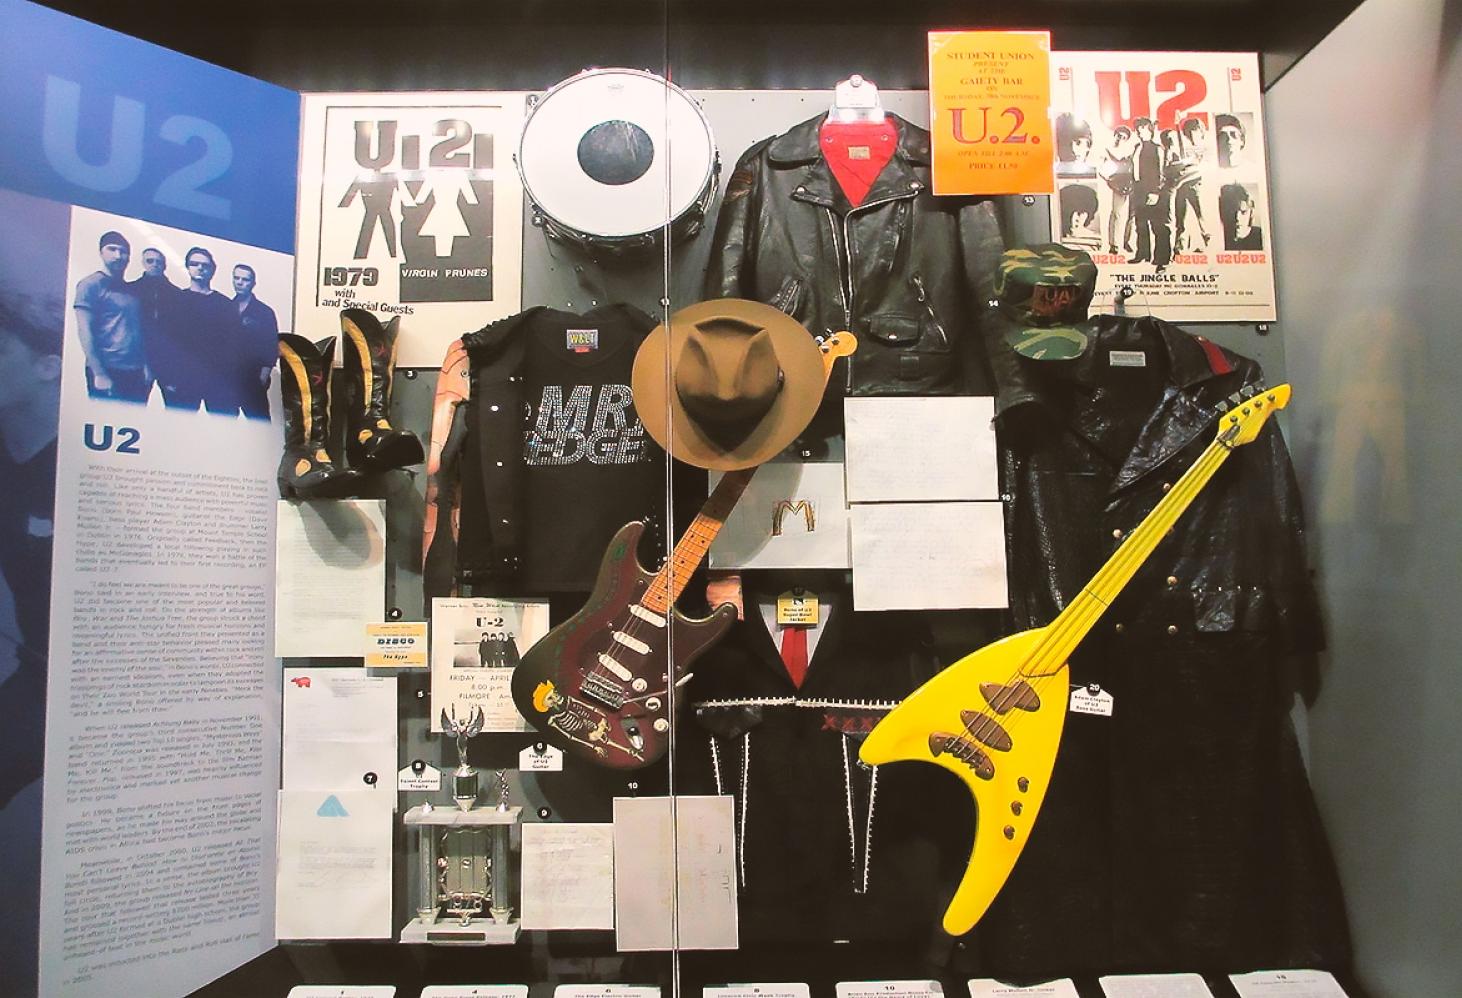 Зал славы рок-н-ролла, Кливленд, Огайо